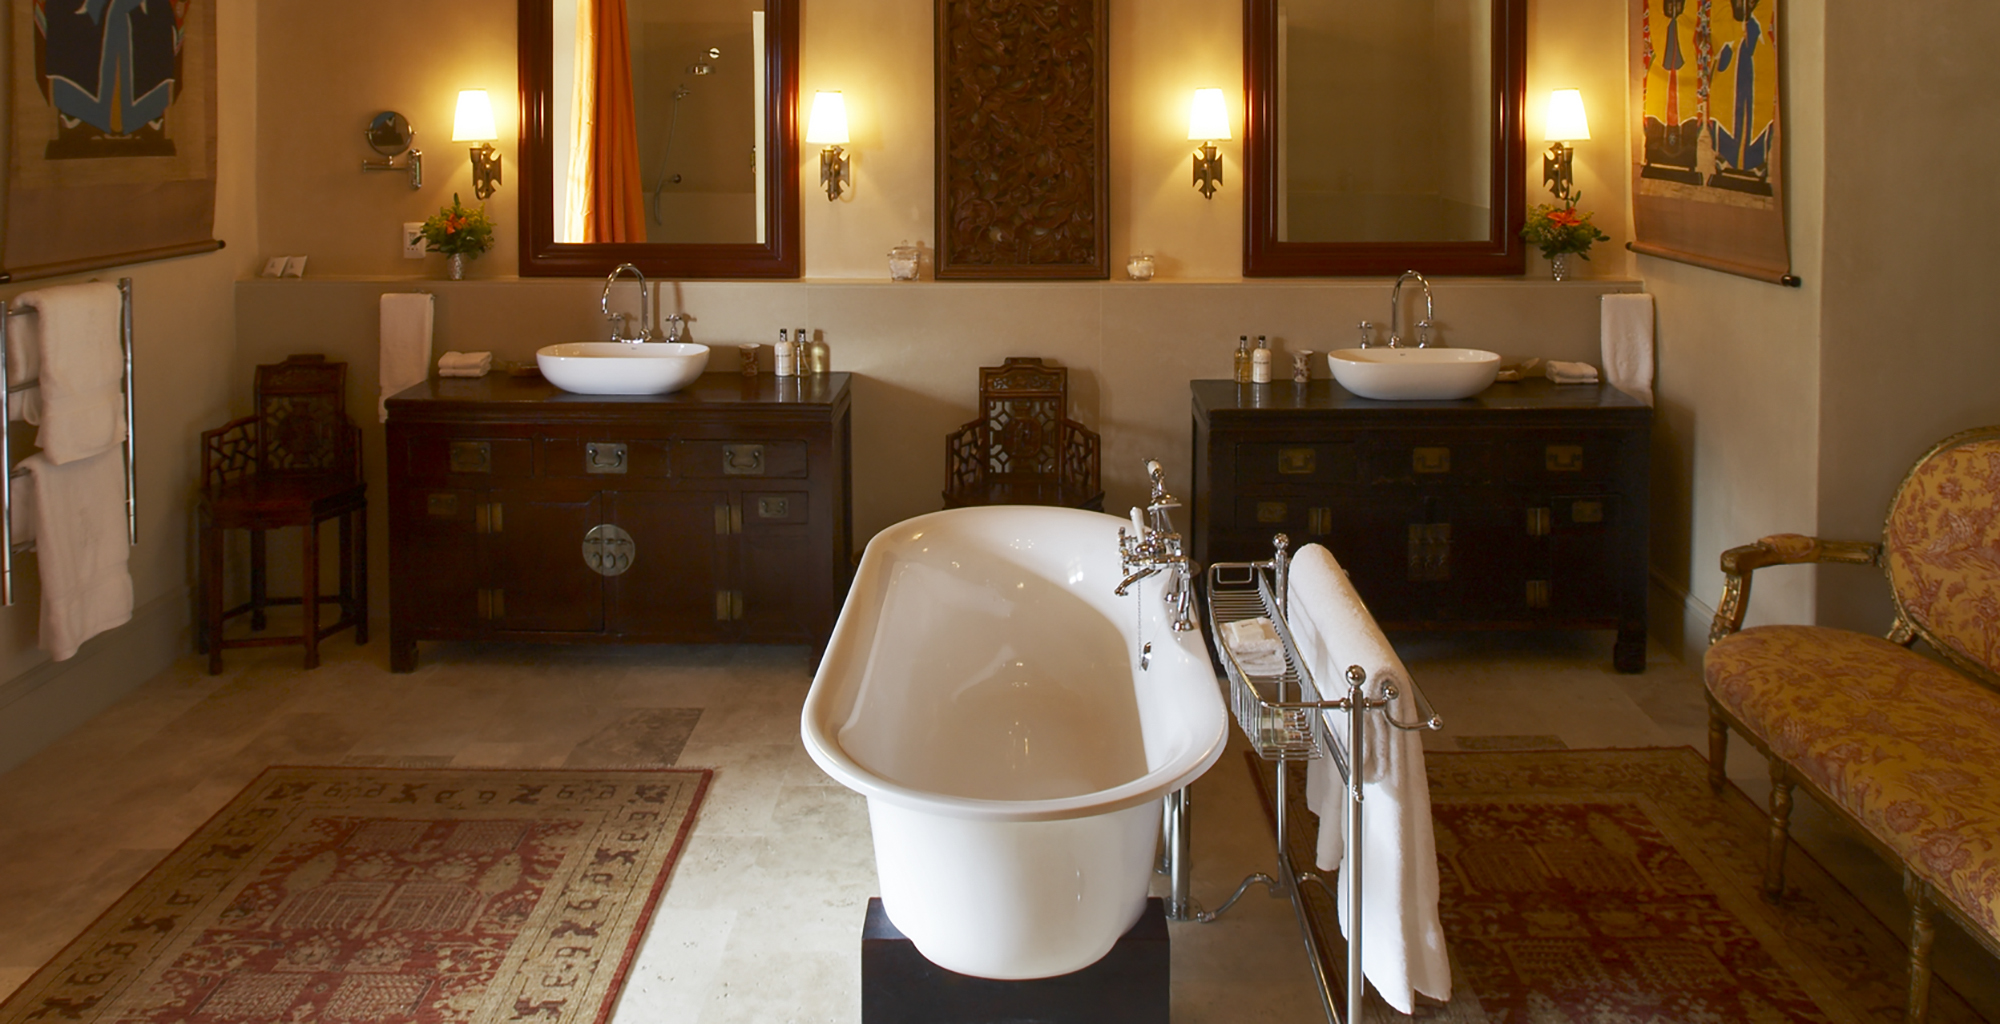 South-Africa-La-Residence-Bathroom